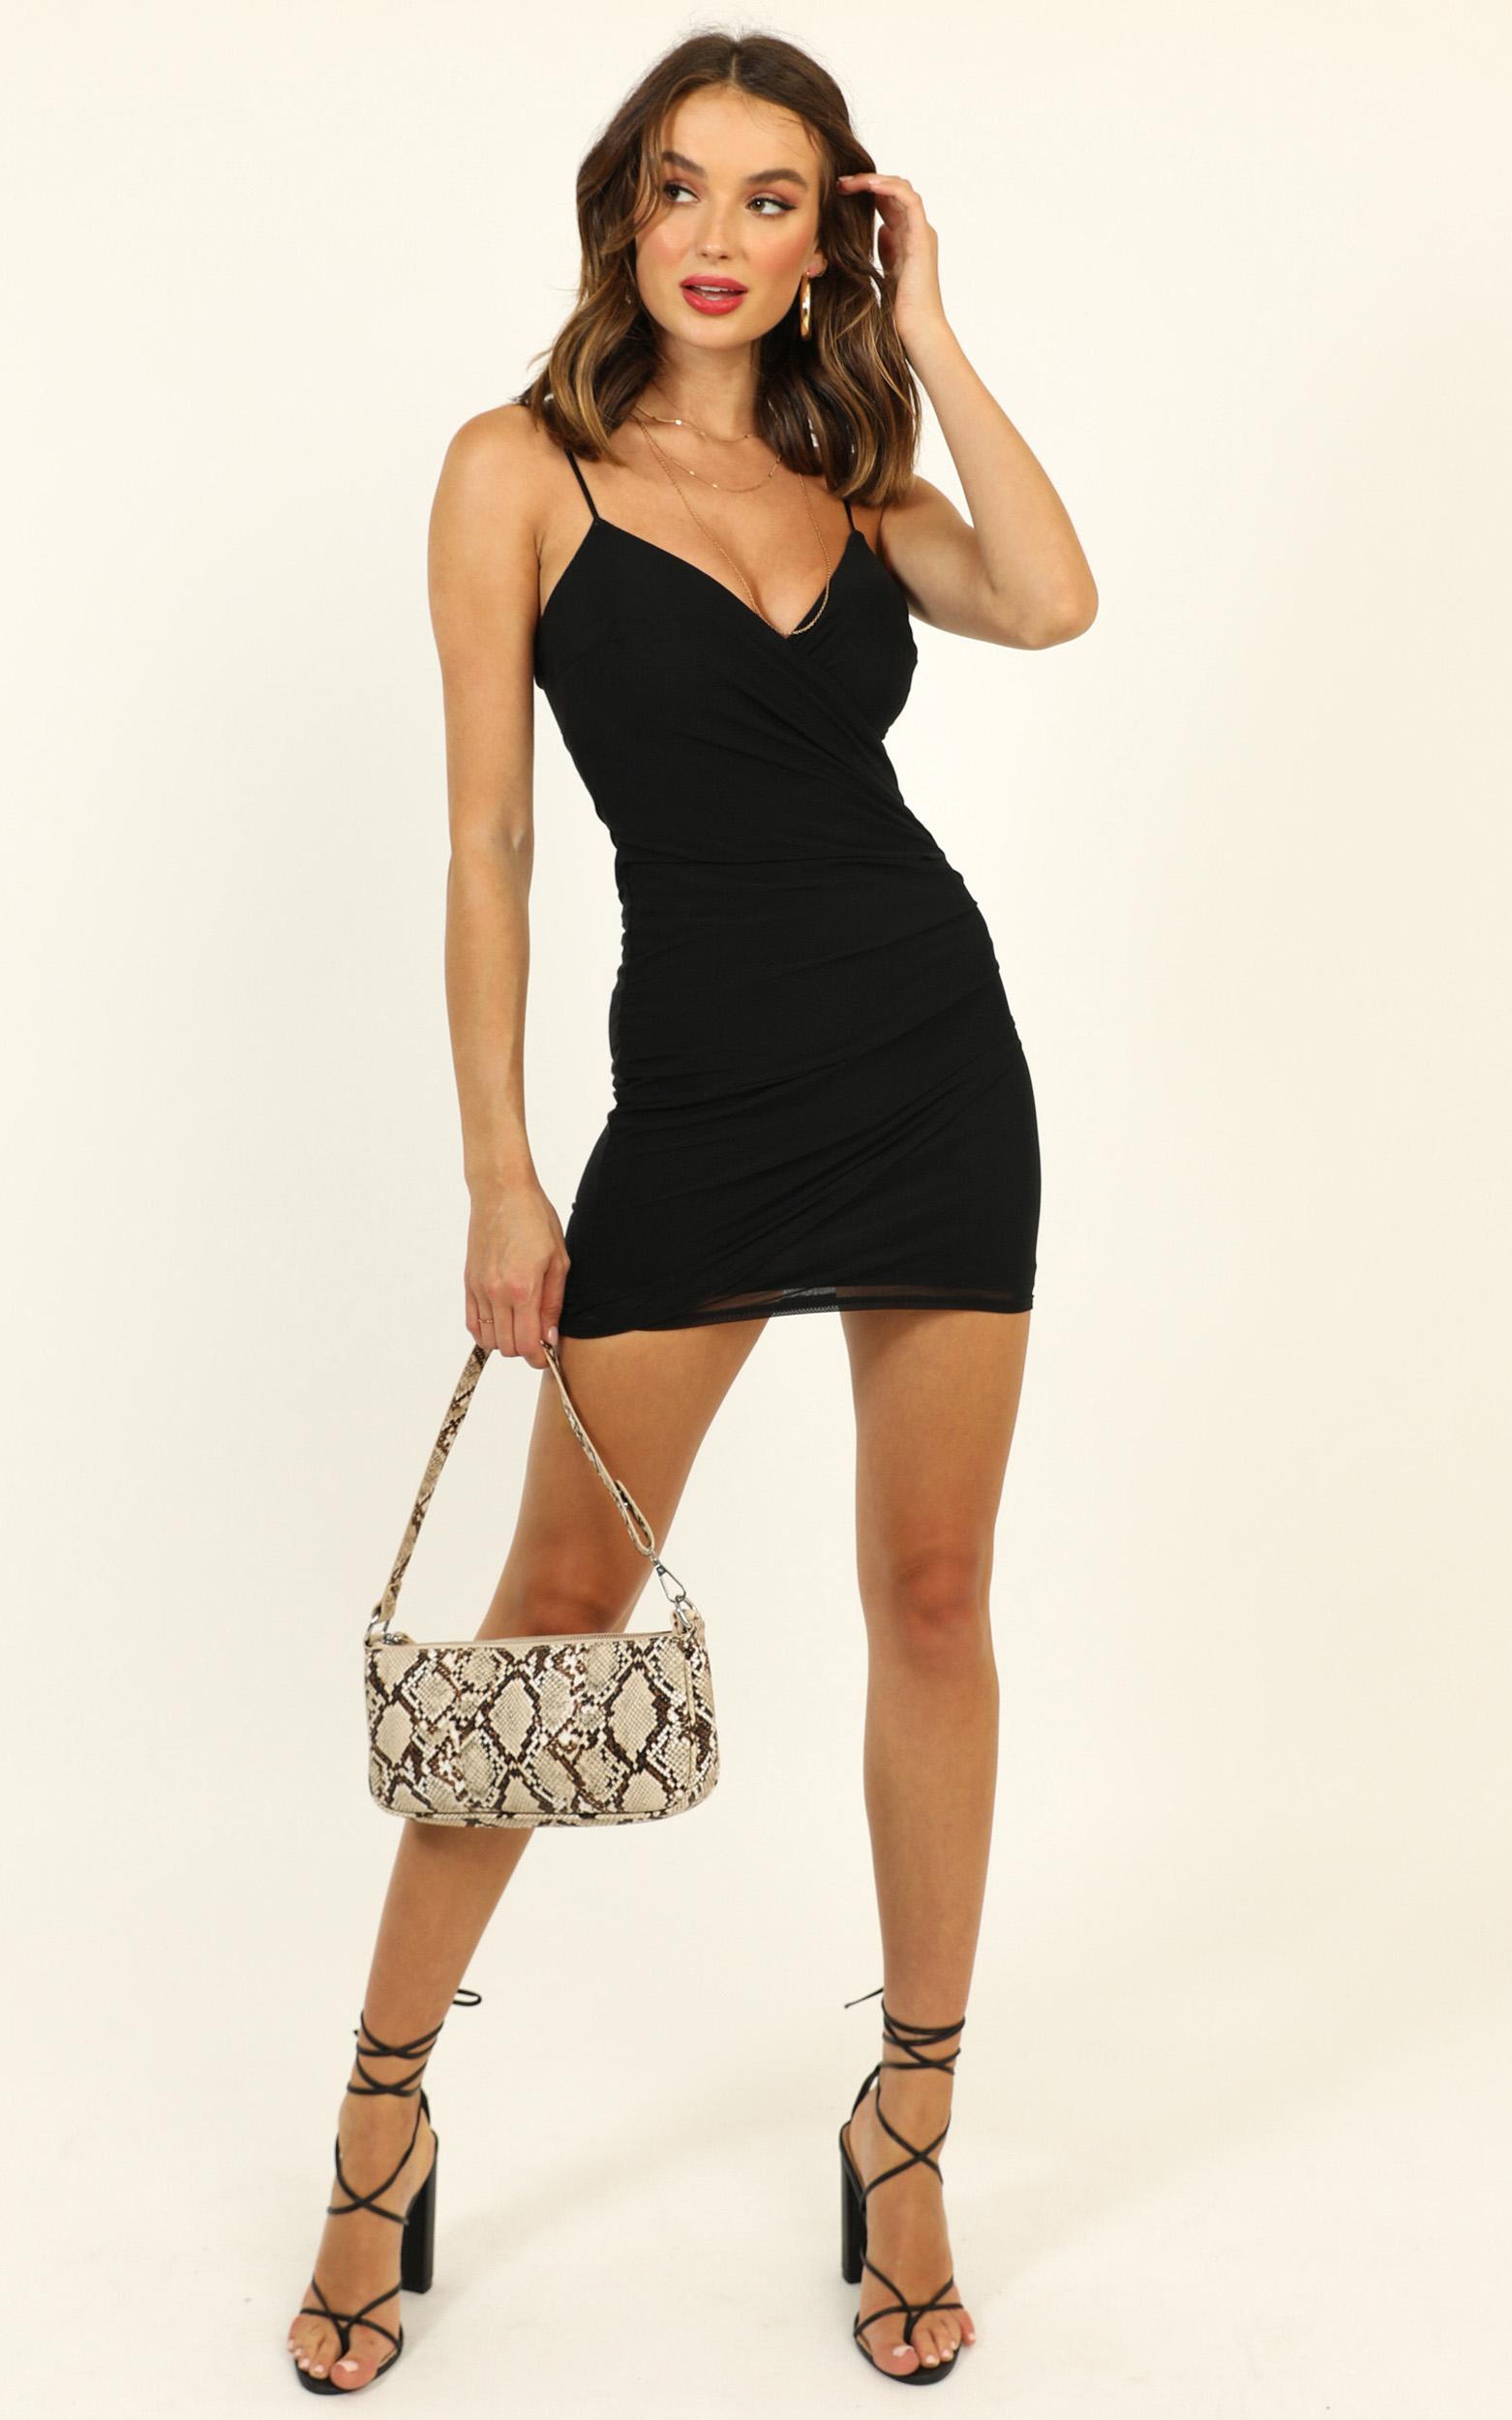 Do You Love Me Dress in black mesh - 6 (XS), Black, hi-res image number null